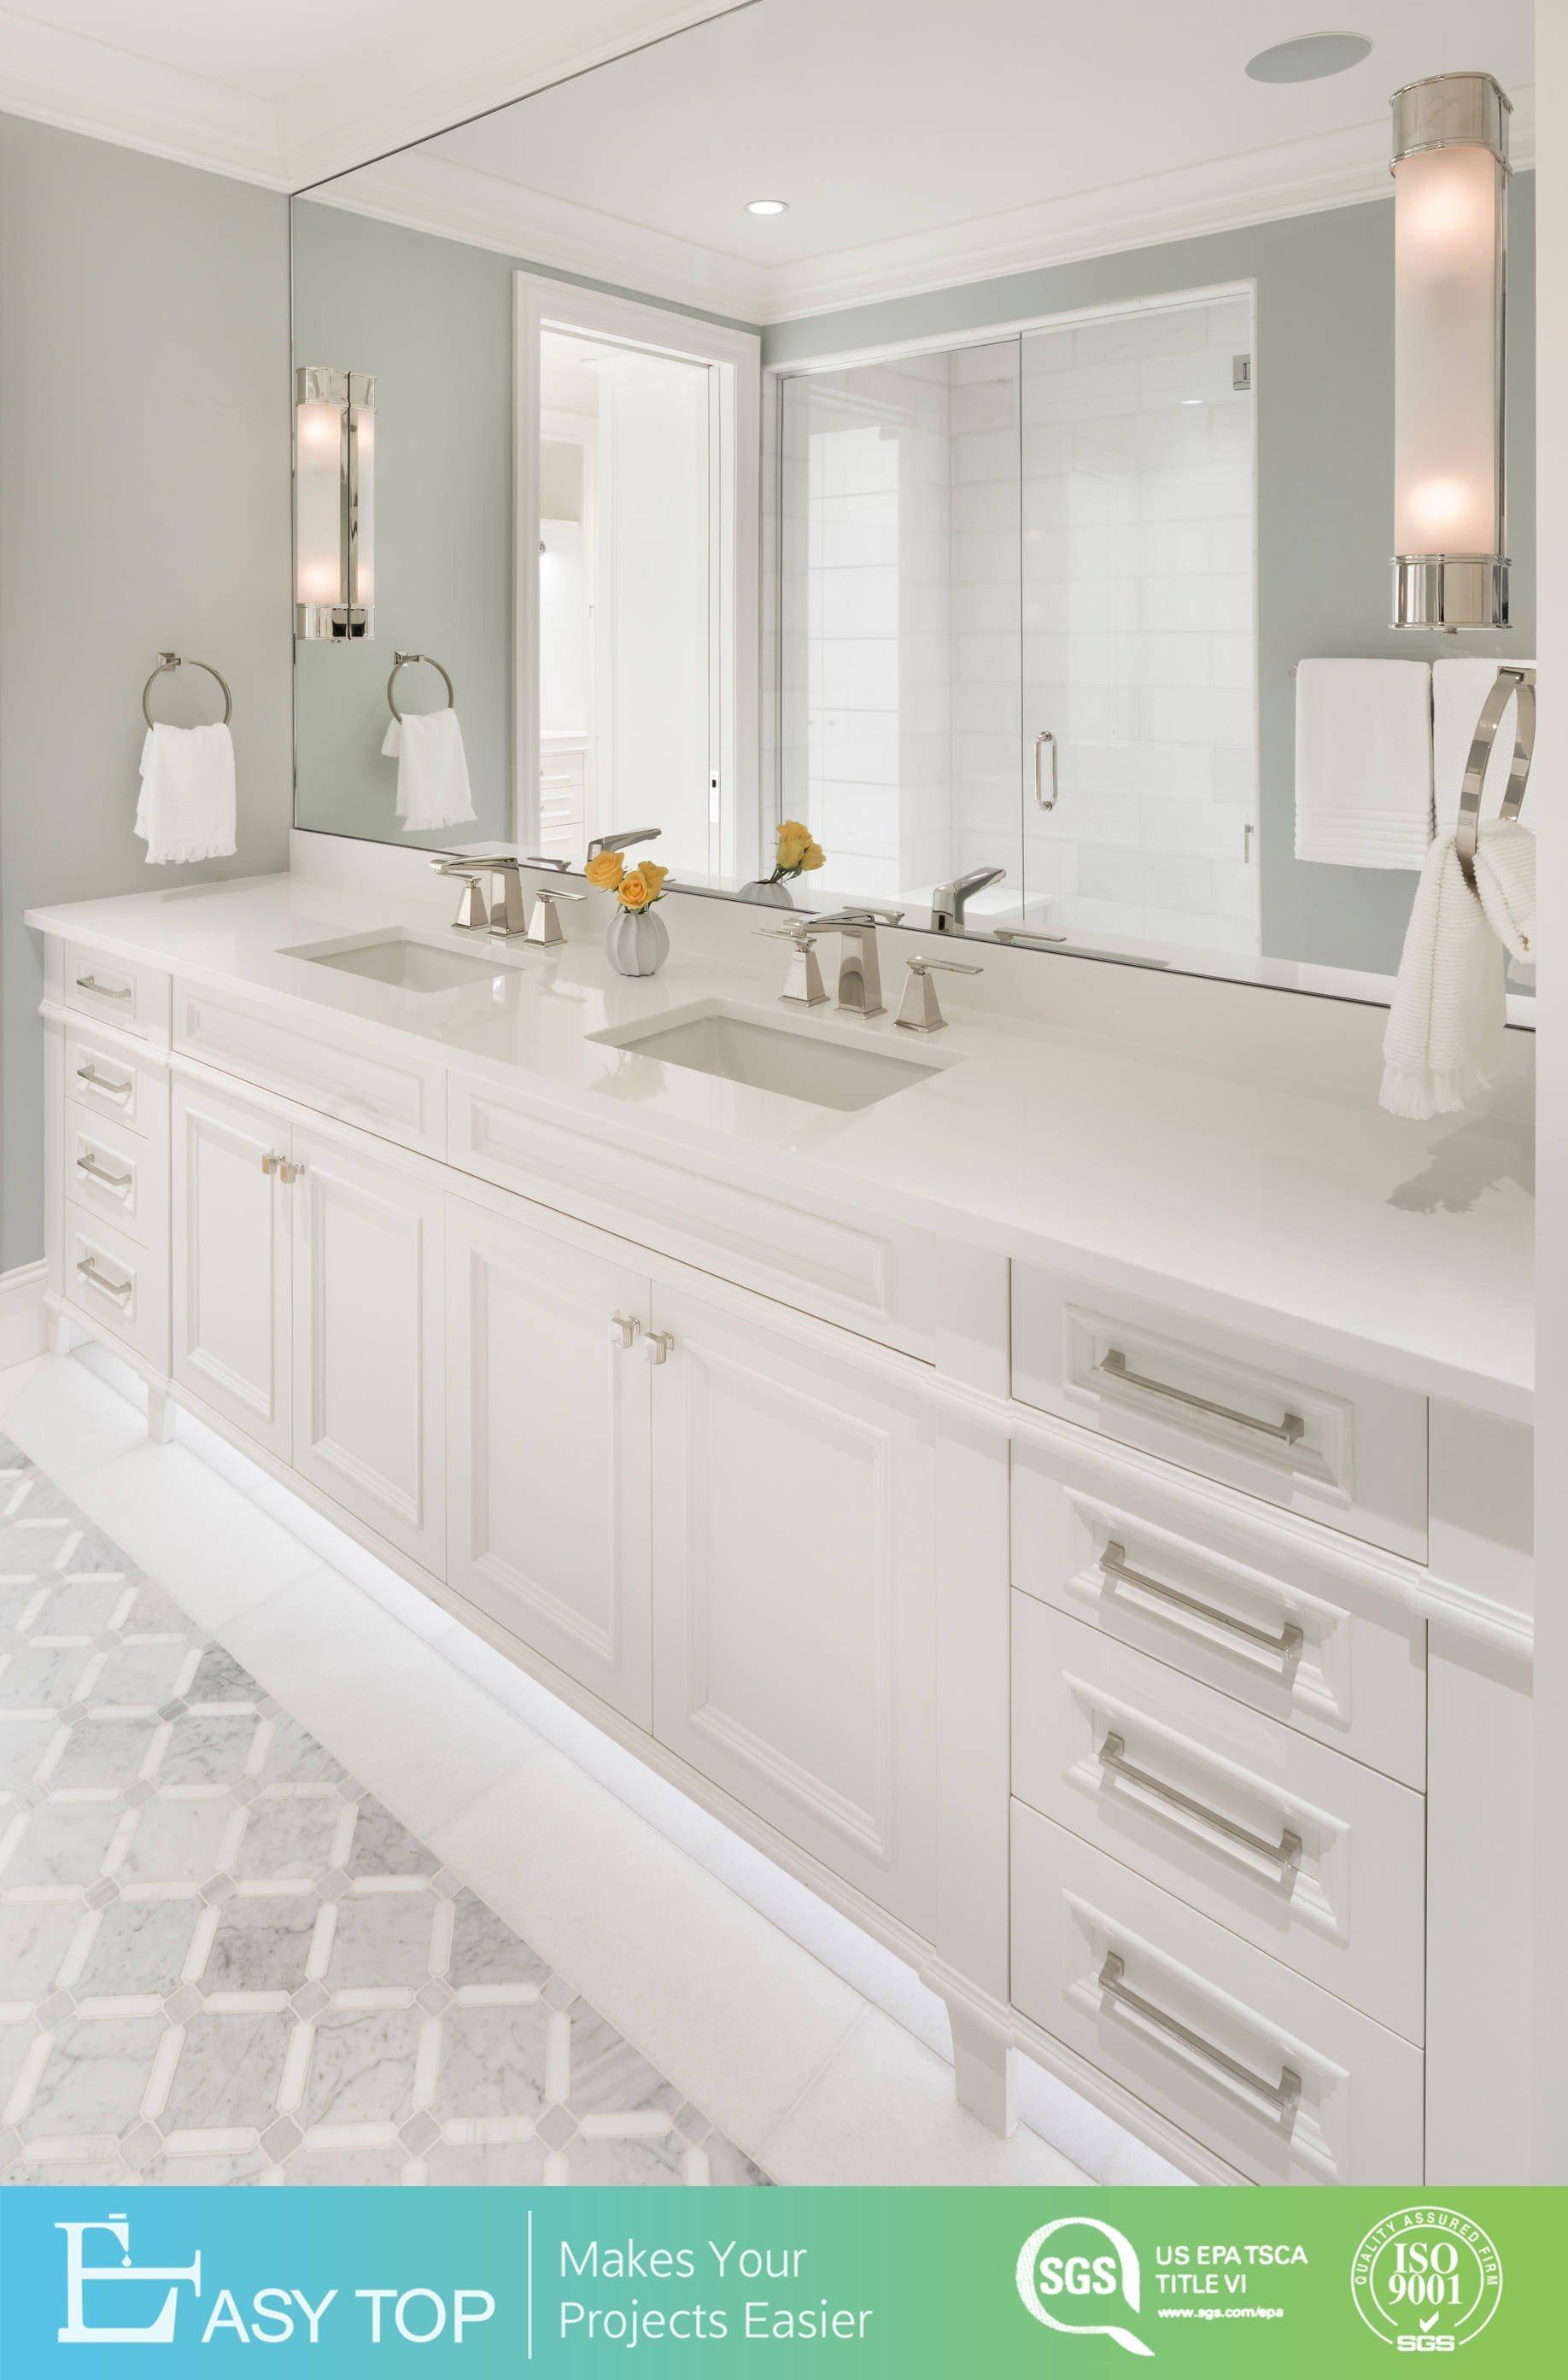 China Commercial Hotel Bedroom Furniture Bathroom Vanity Modern Tall Mirror Bathroom Cabinet Vanity China Bathroom Cabinet Set Vanity Sink